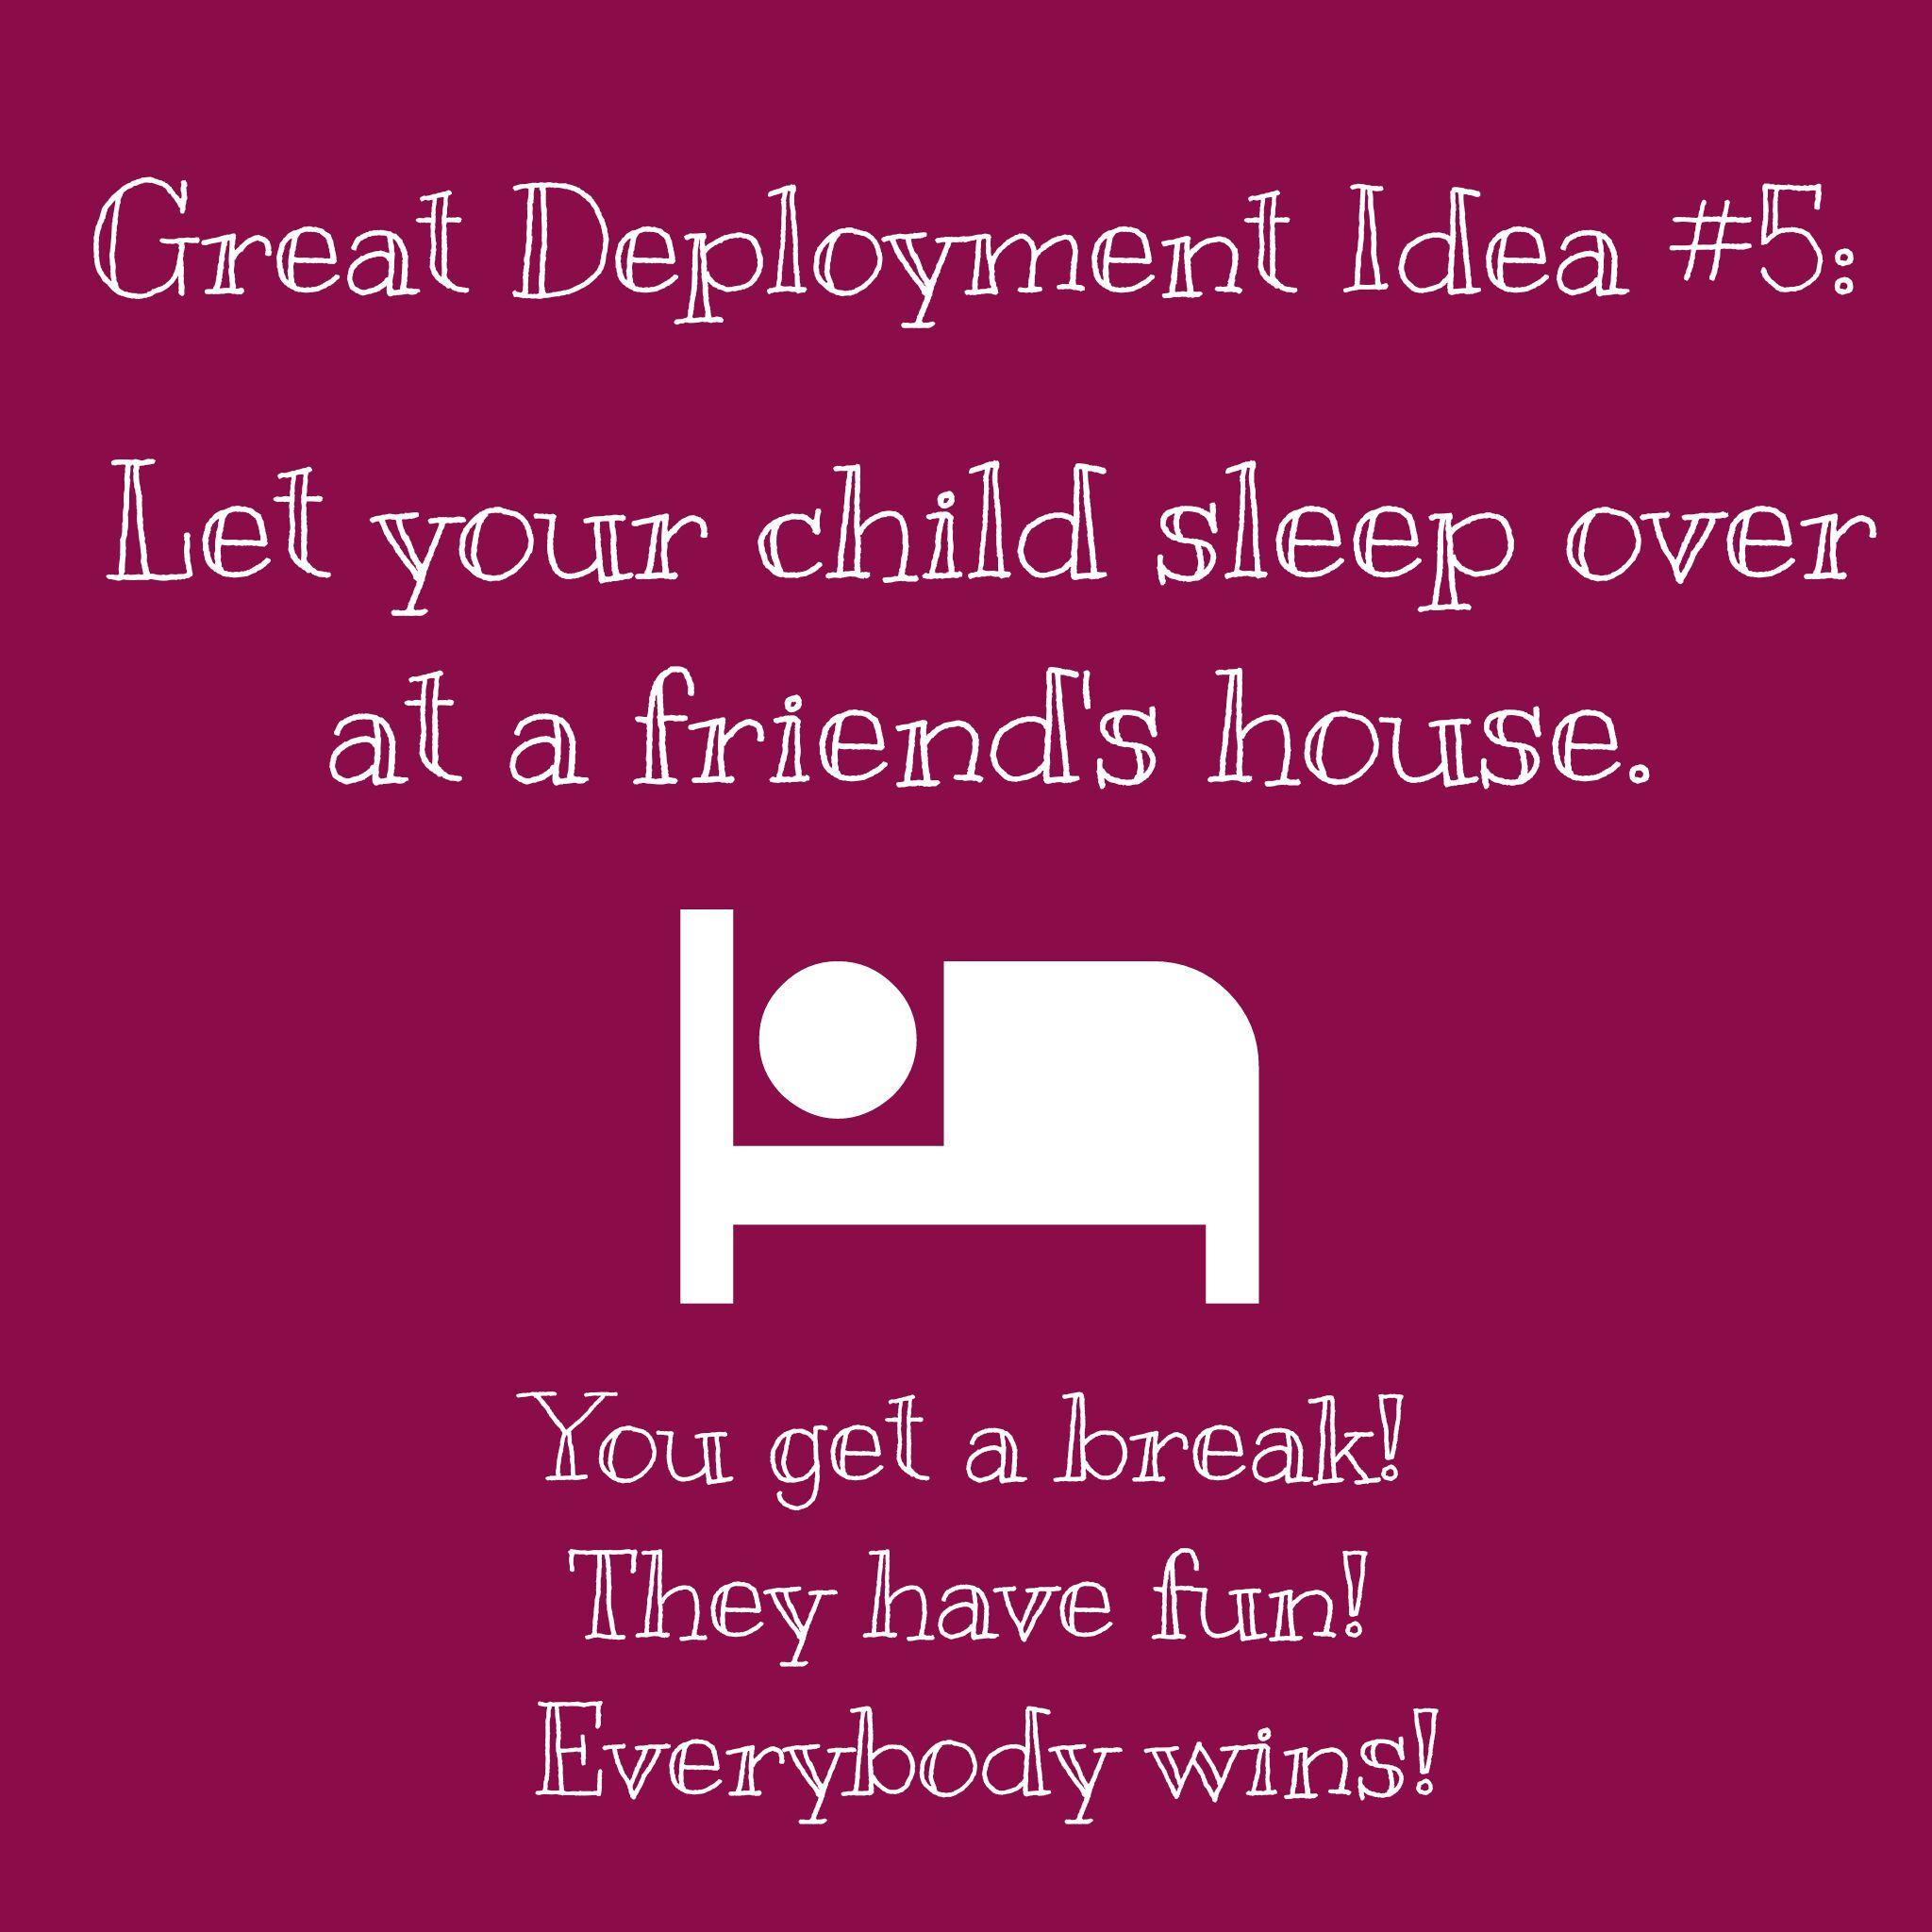 Sleepovers during deployments